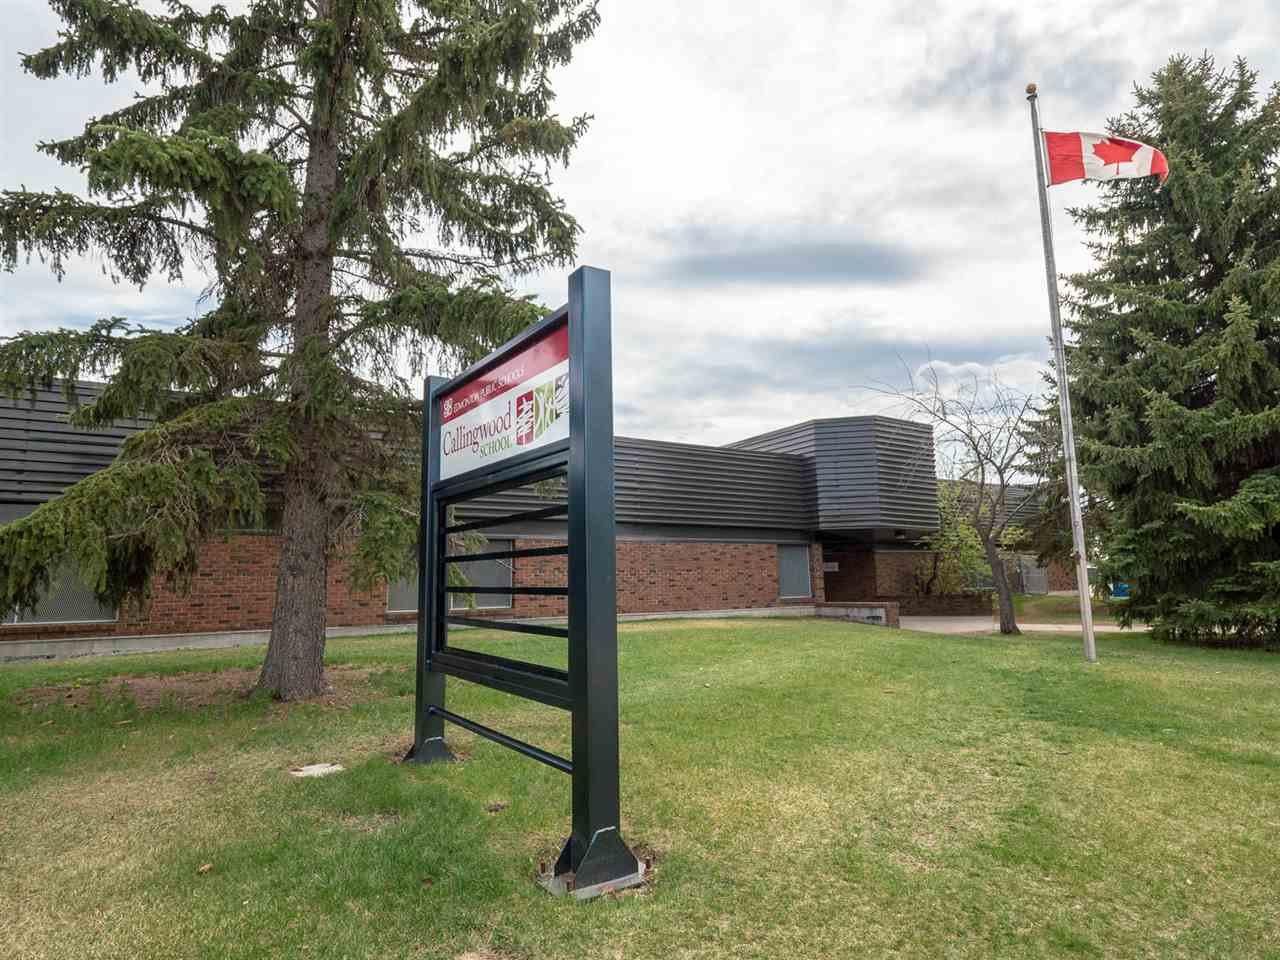 Homes for Sale Edmonton $200,000-$299,000